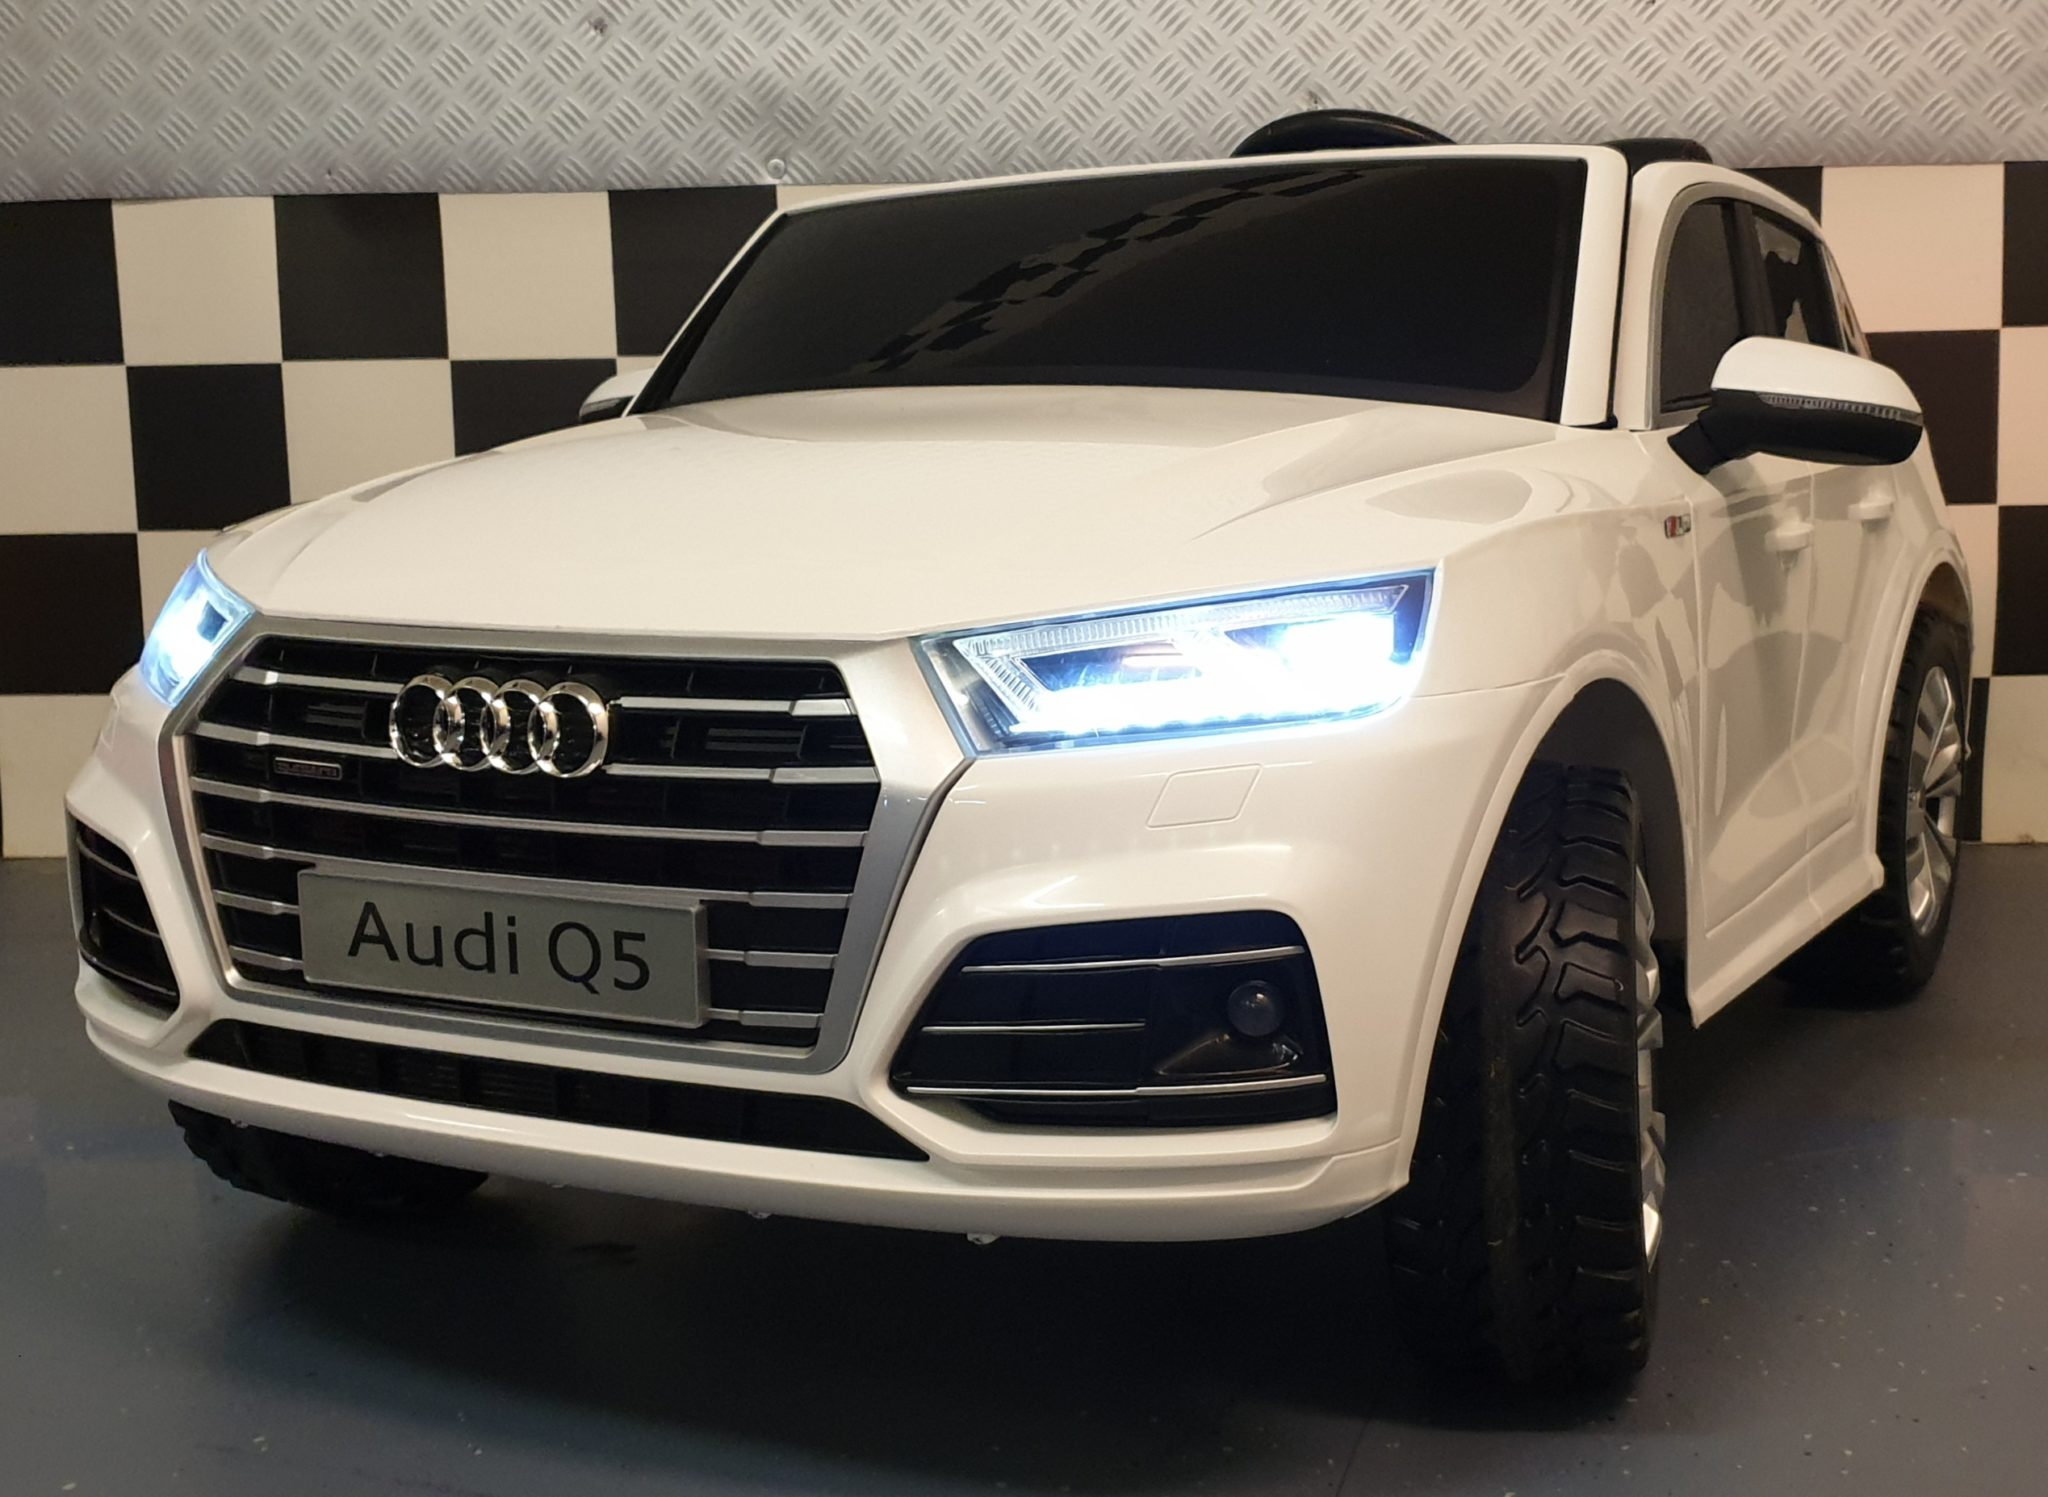 Elektrische kinderauto Audi Q5 2 persoons wit 2.4G 4WD en MP4